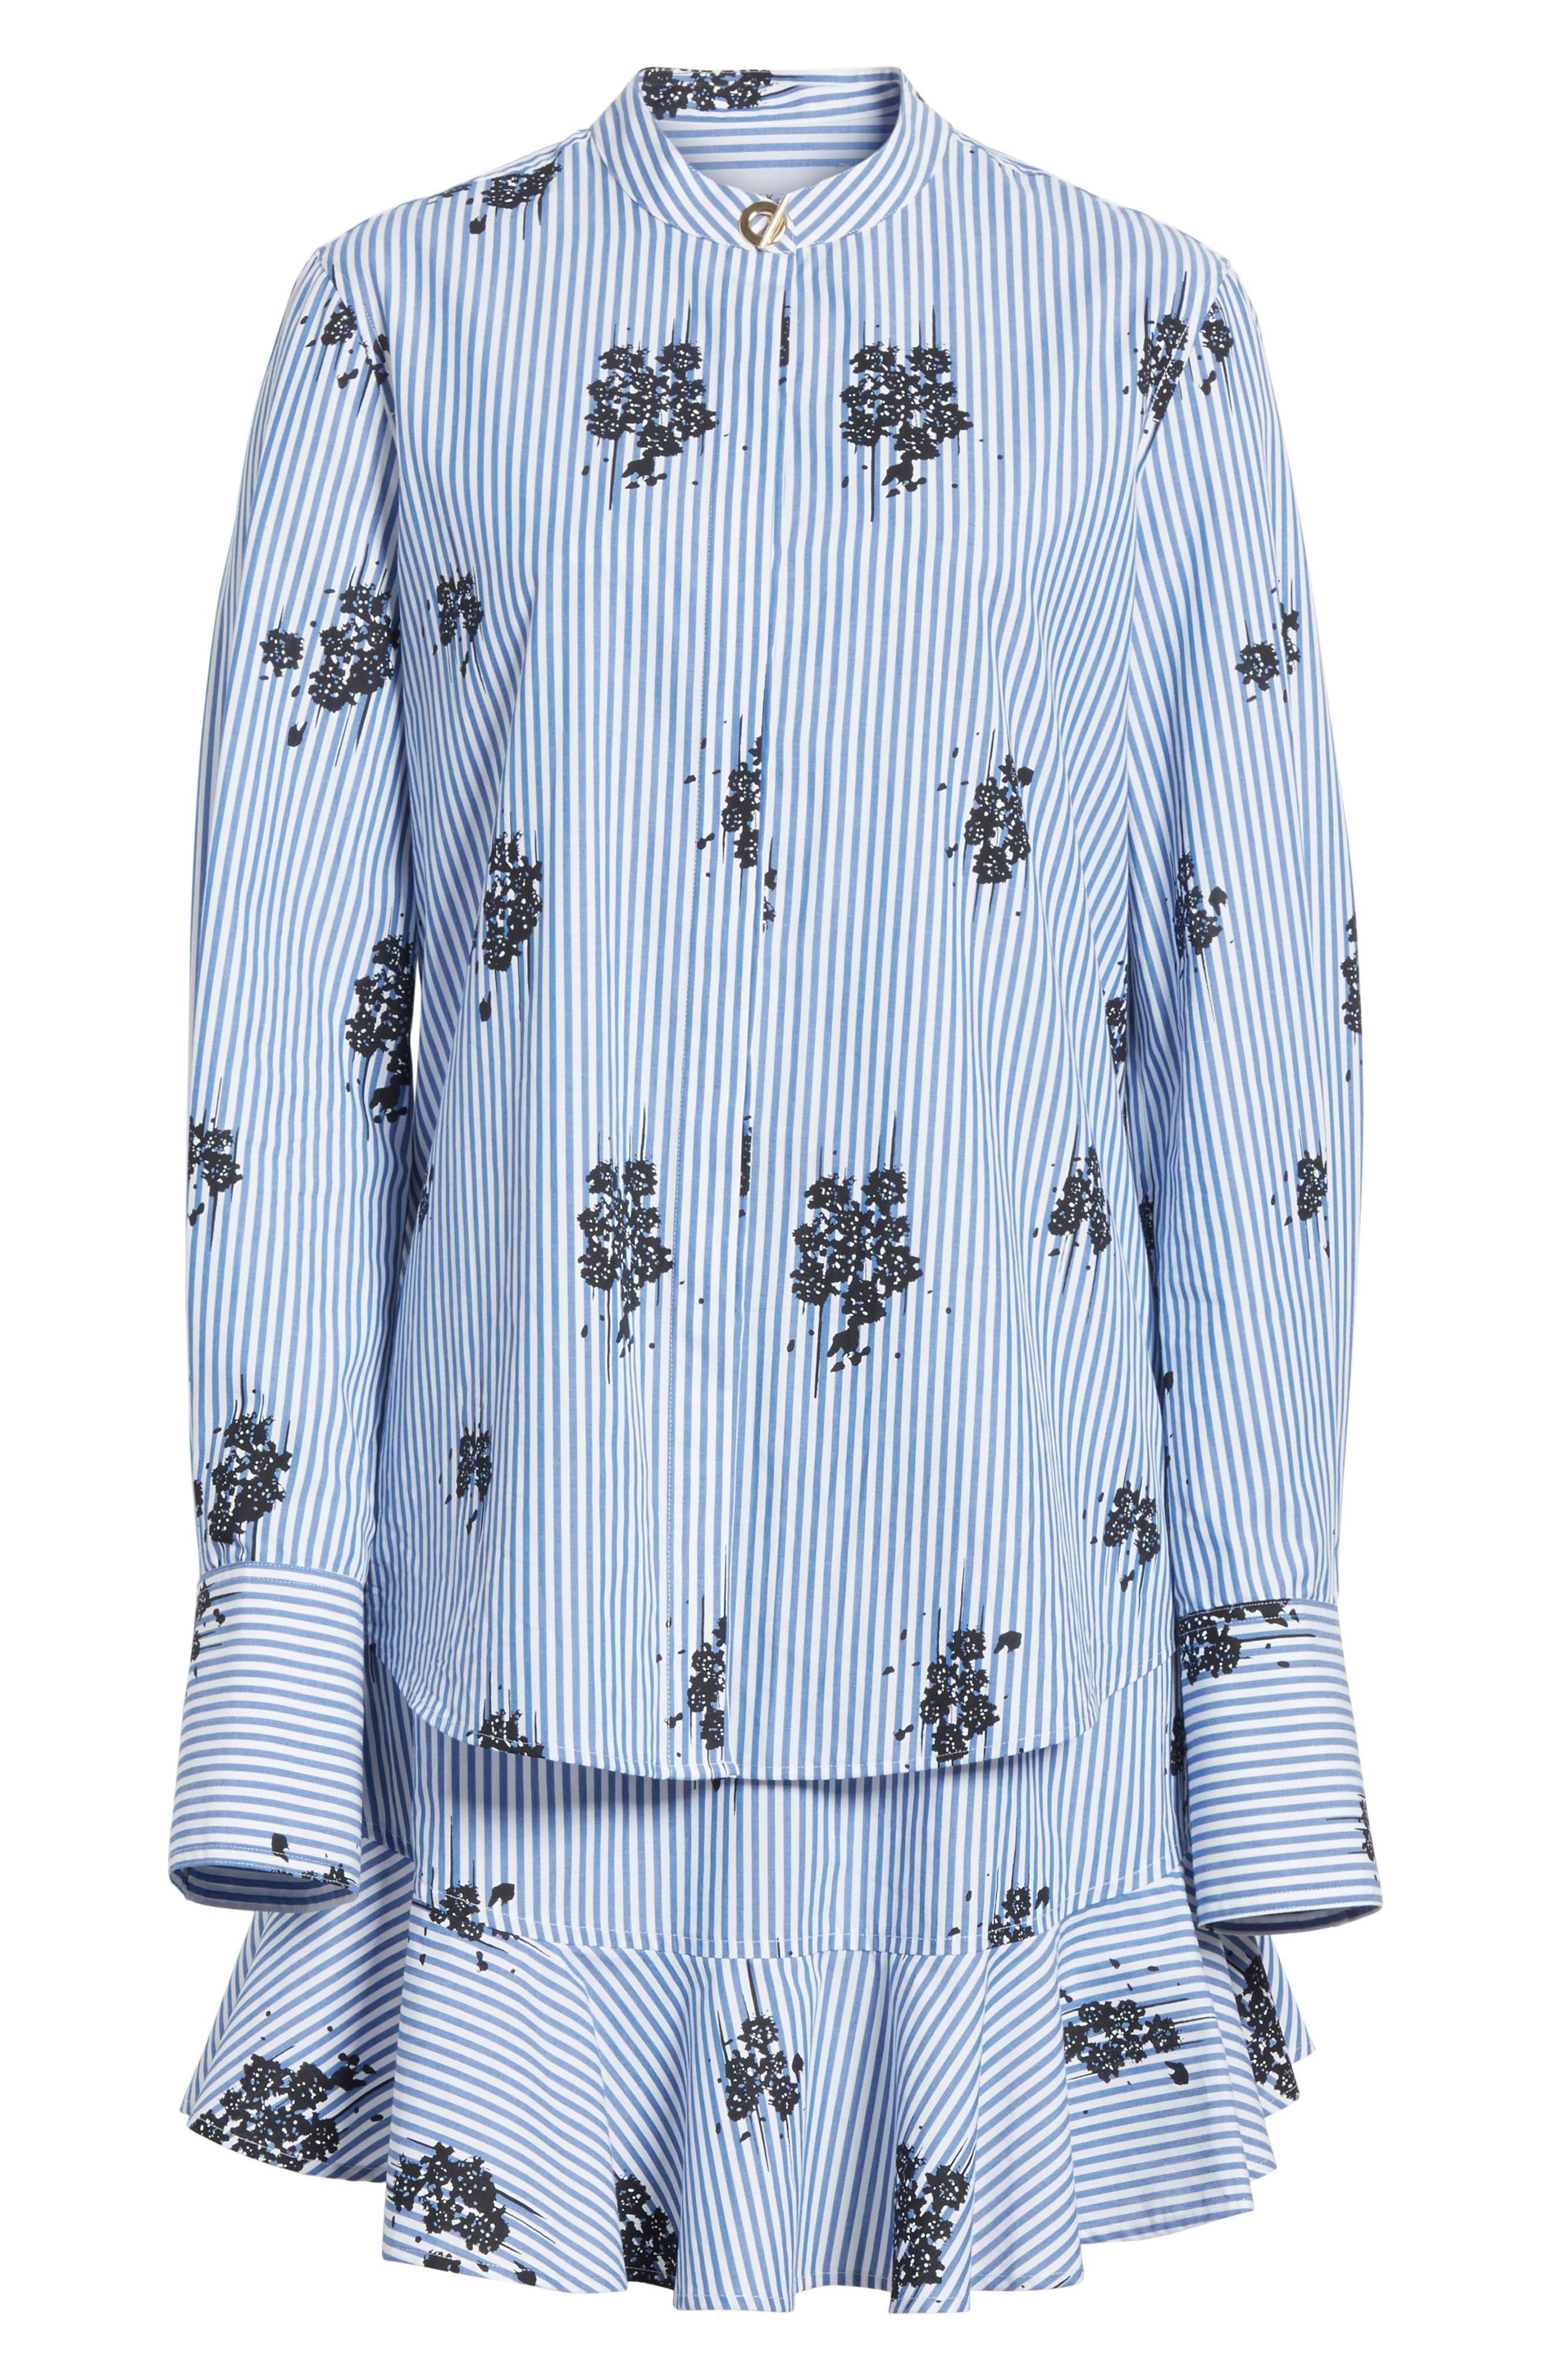 2-in-1 Ruffled Shirtdress,                             Alternate thumbnail 7, color,                             420